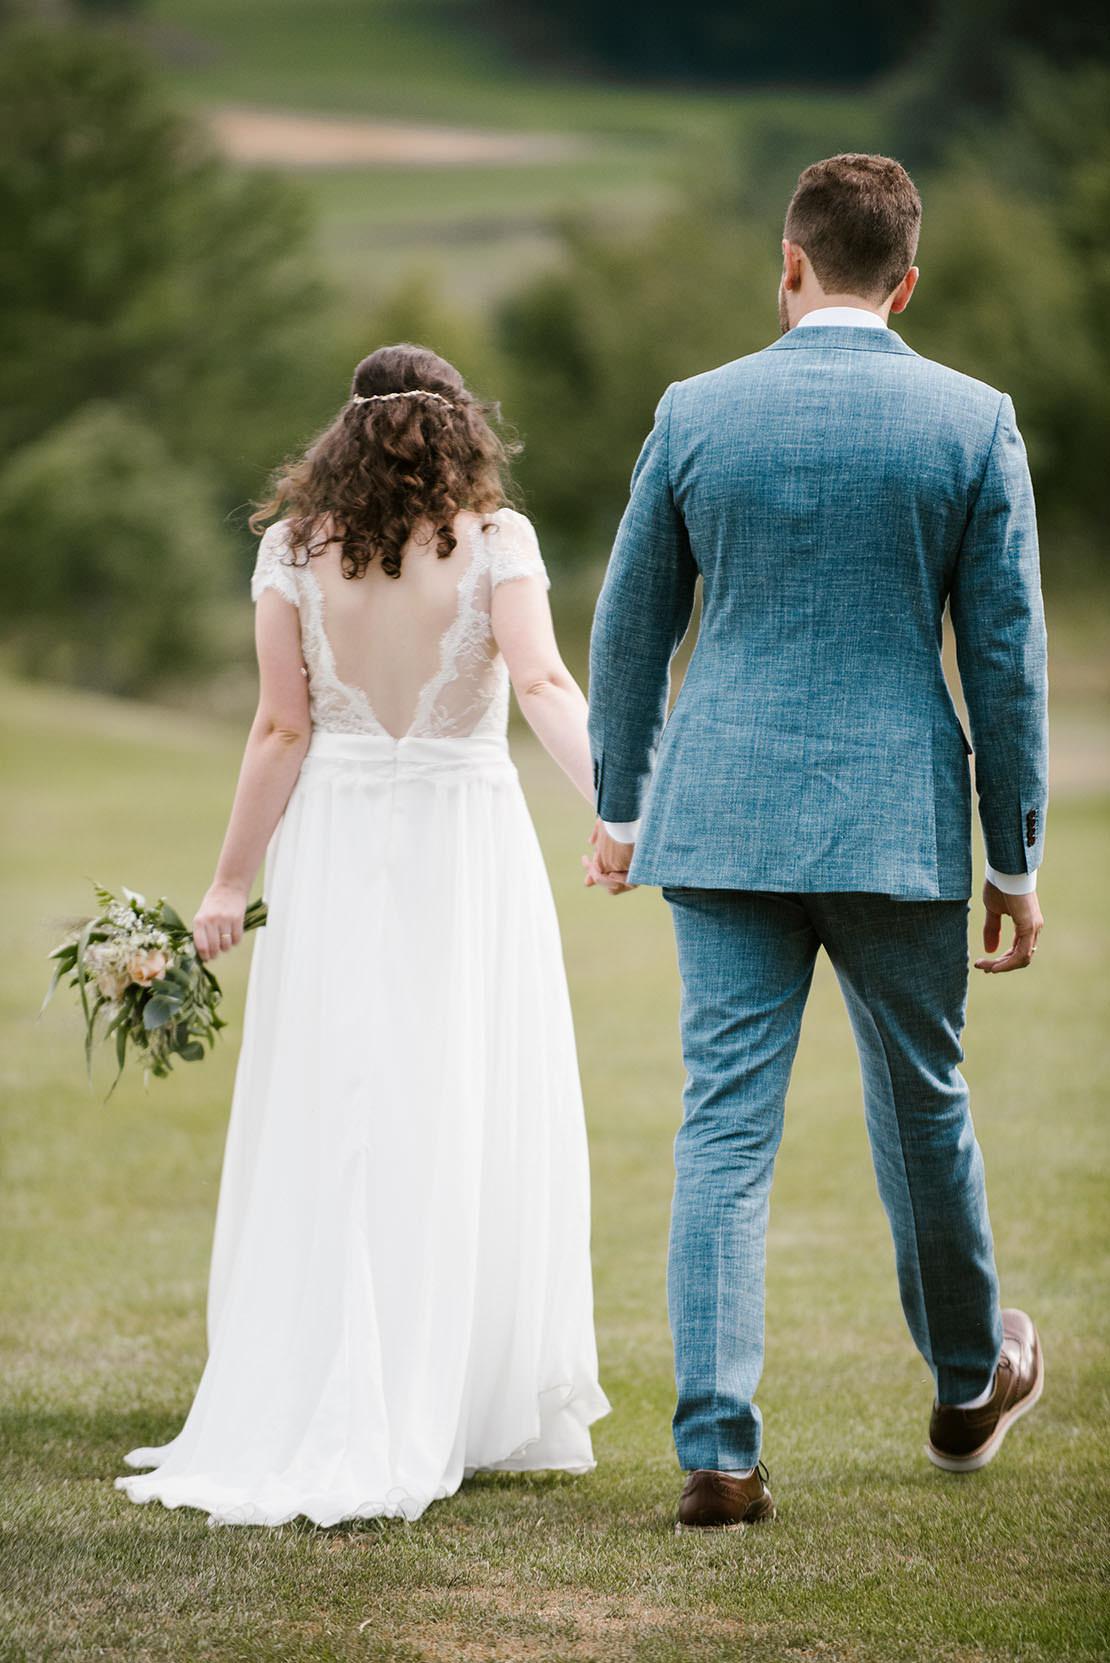 photographe mariage suisse geneve monika breitenmoser couple